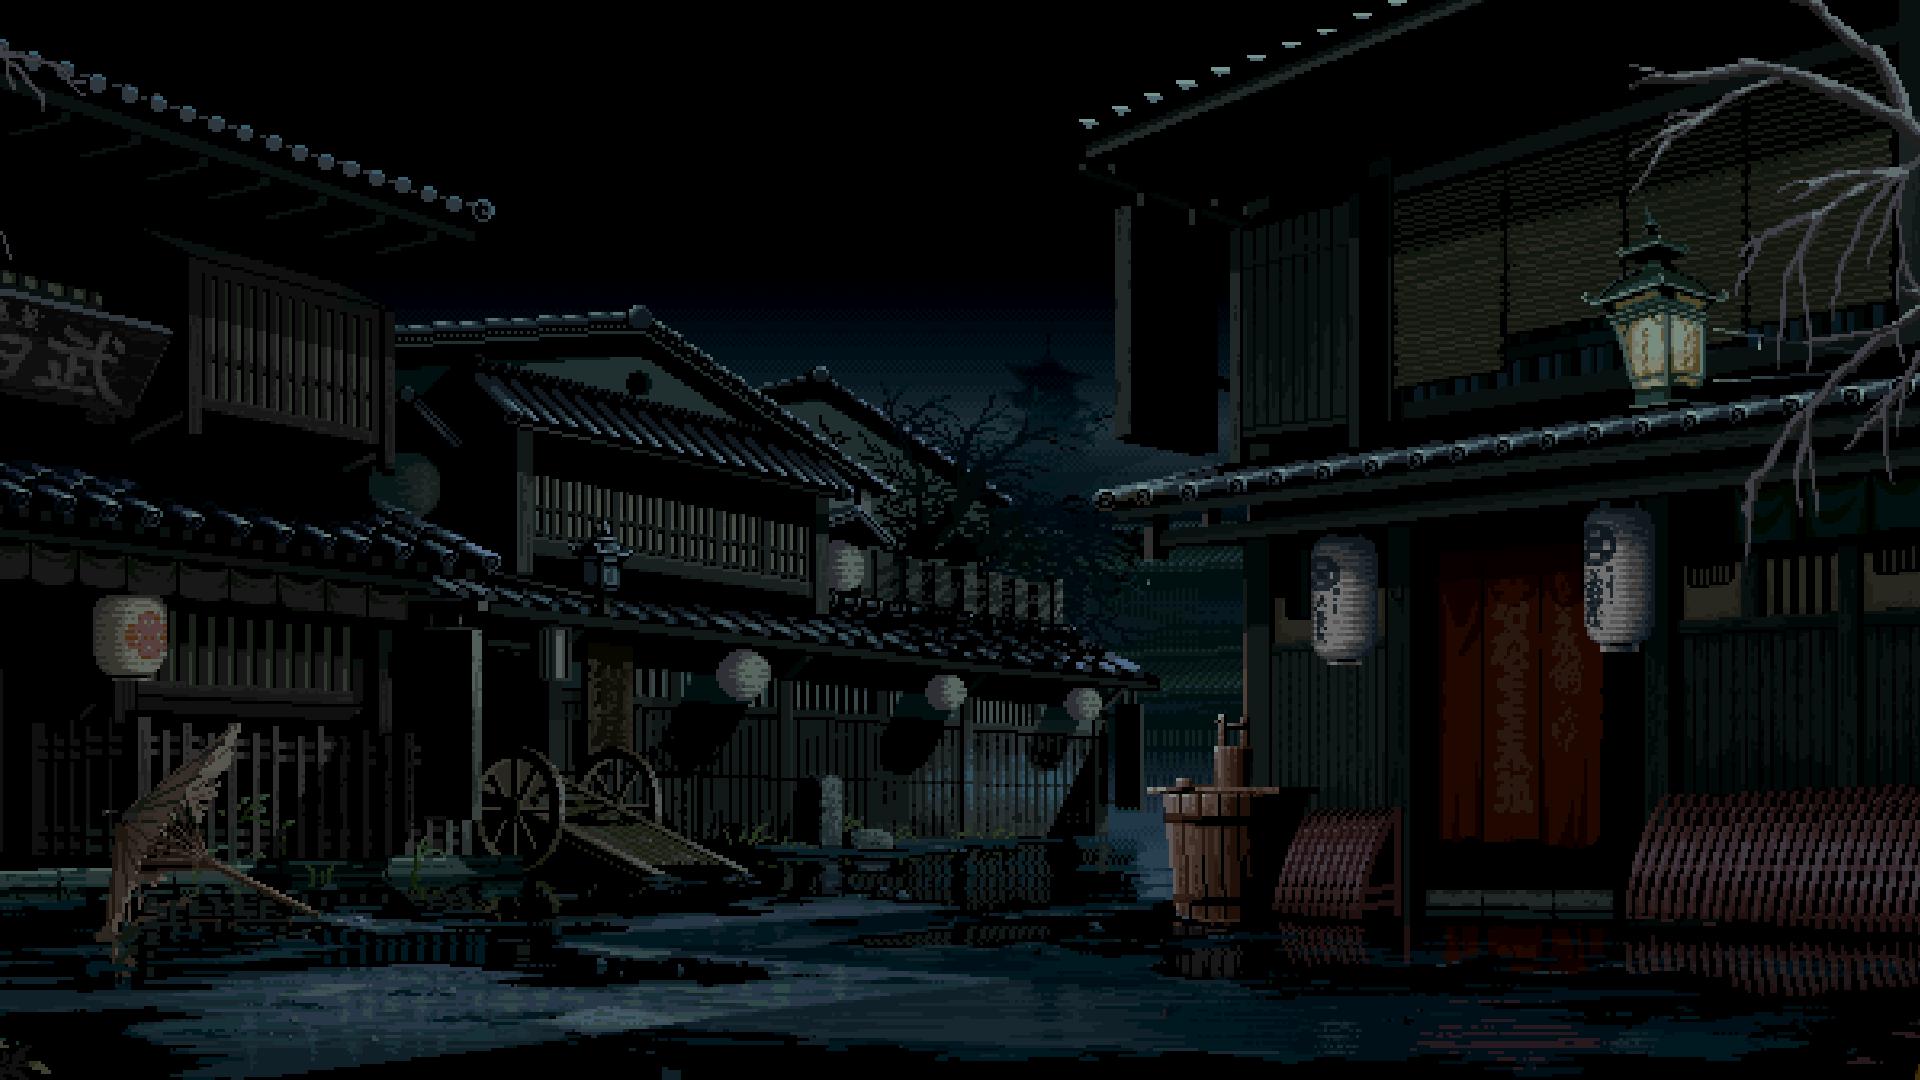 General 1920x1080 digital art pixel art pixelated pixels nature landscape Asian architecture house video games retro games 8-bit street night The Last Blade